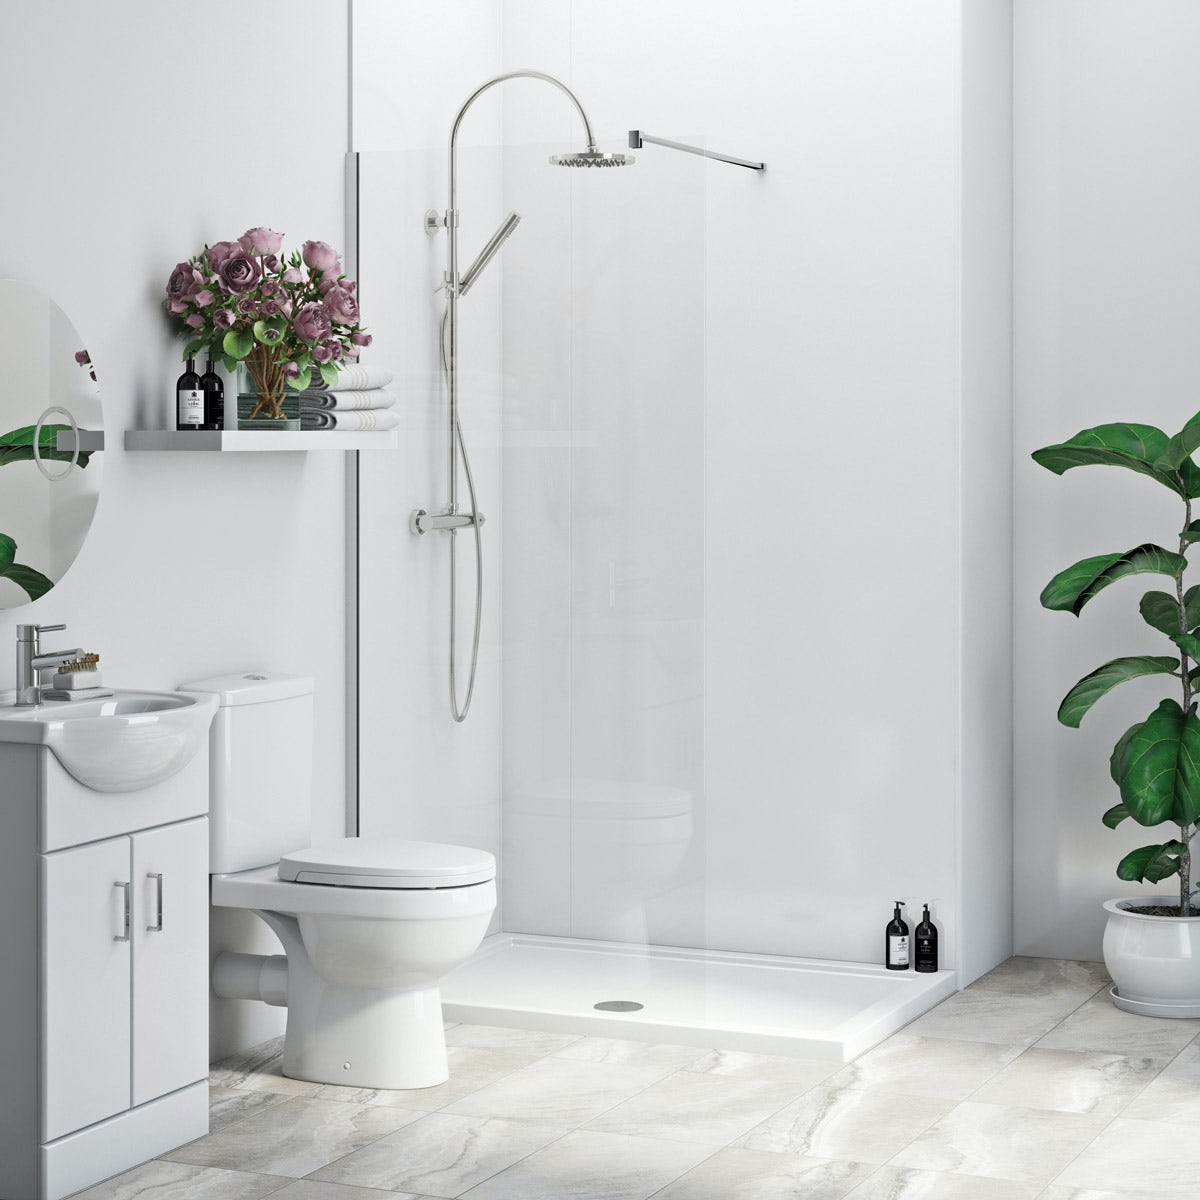 Multipanel Economy Snow Drift shower wall single panel